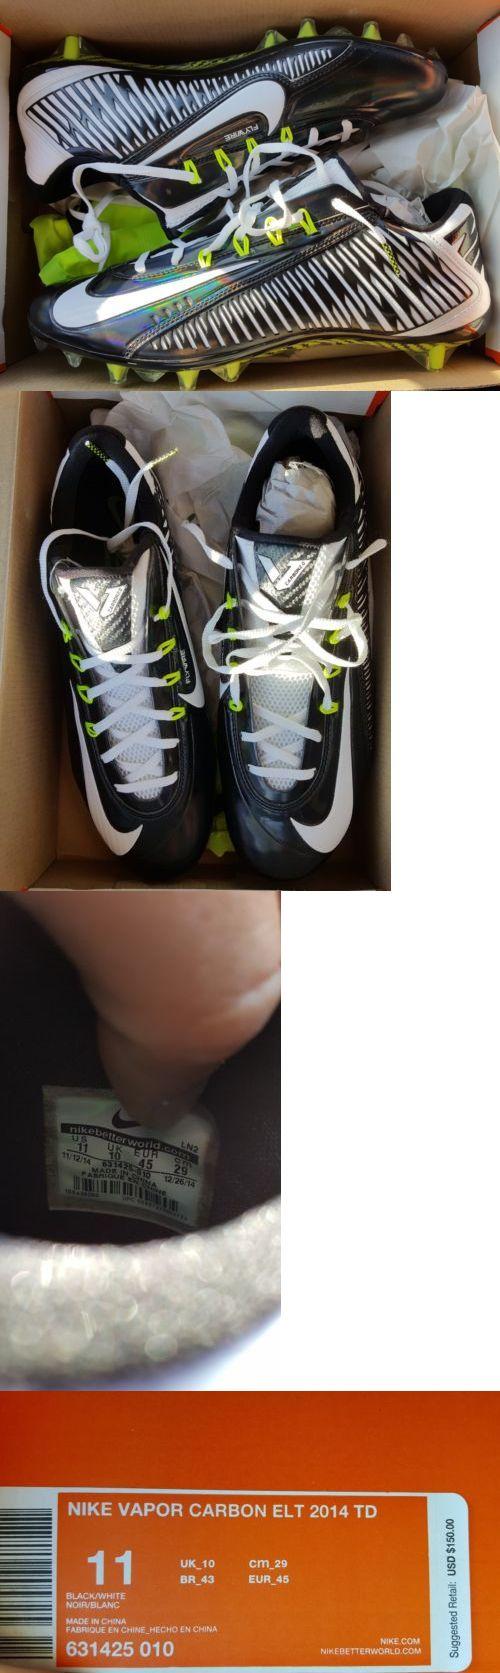 Men 159116: Nike Vapor Carbon Elite 2014 Td Football Cleats Size 11 Black White $150 Nib -> BUY IT NOW ONLY: $47.99 on eBay!